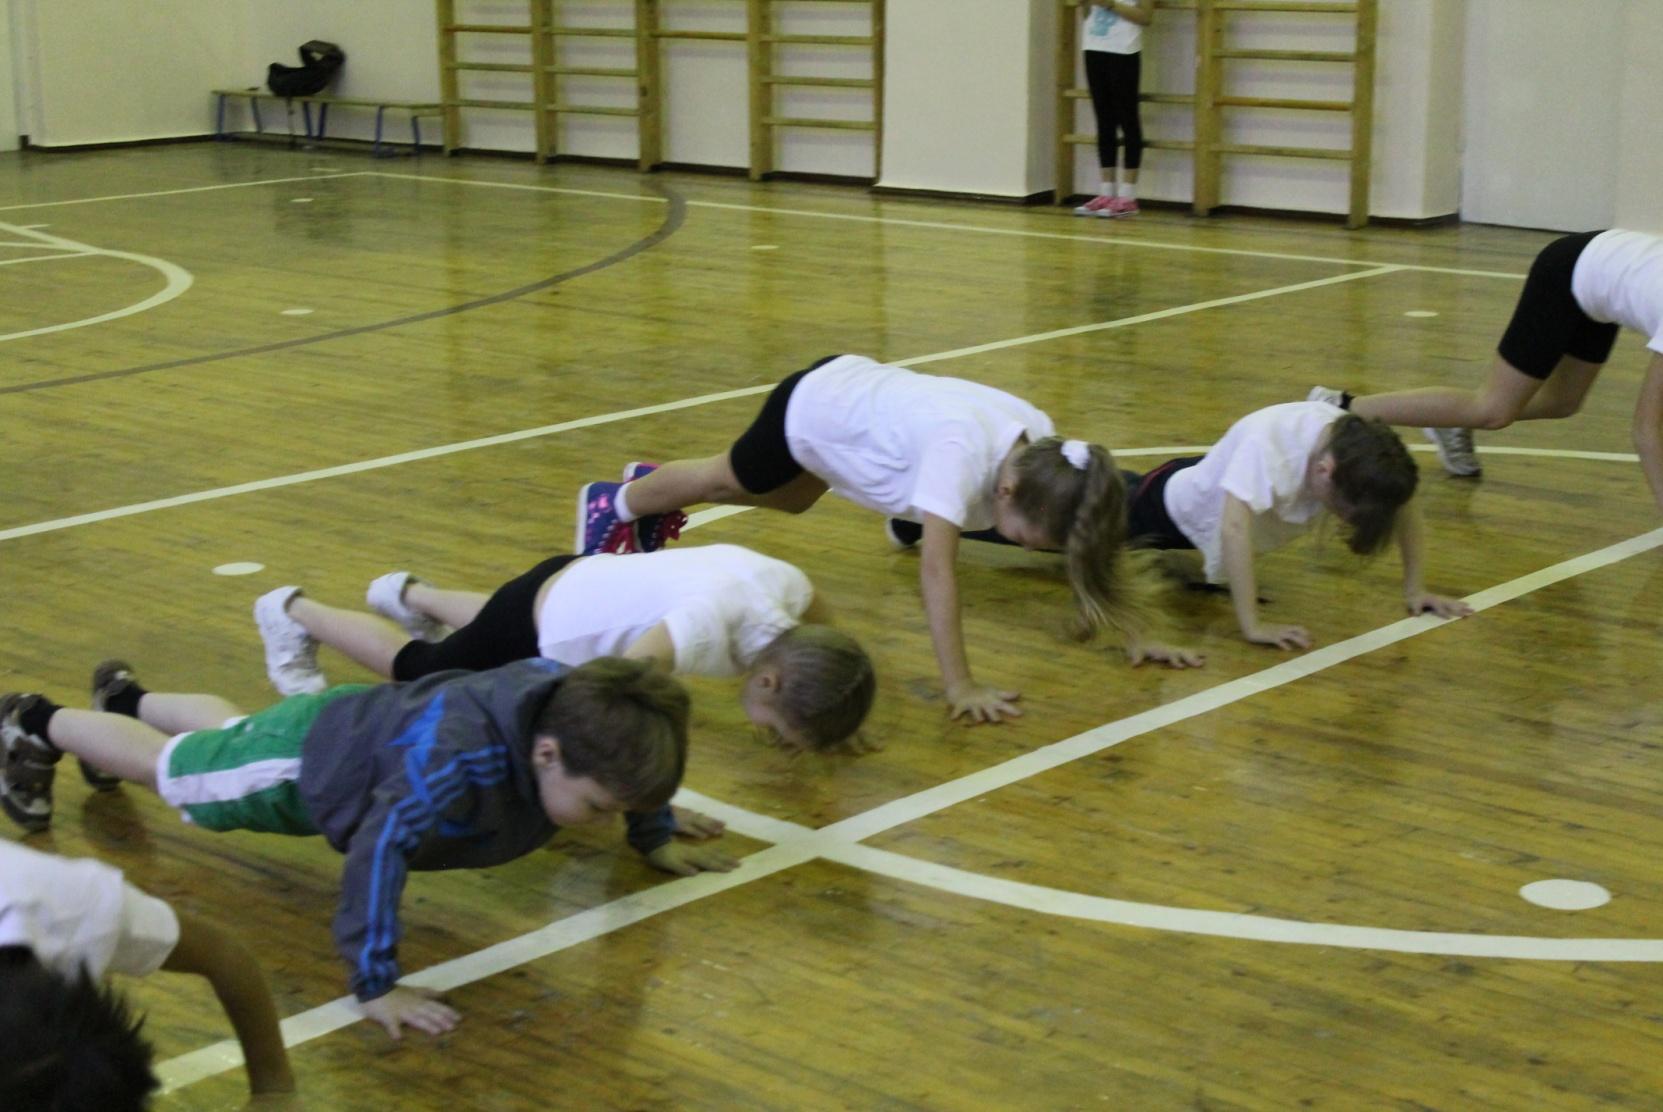 D:\фото\школа 2014\солнечный город спартакиада\солнечная спартакиада\тяжолая атлетика\т.а\IMG_5645.JPG